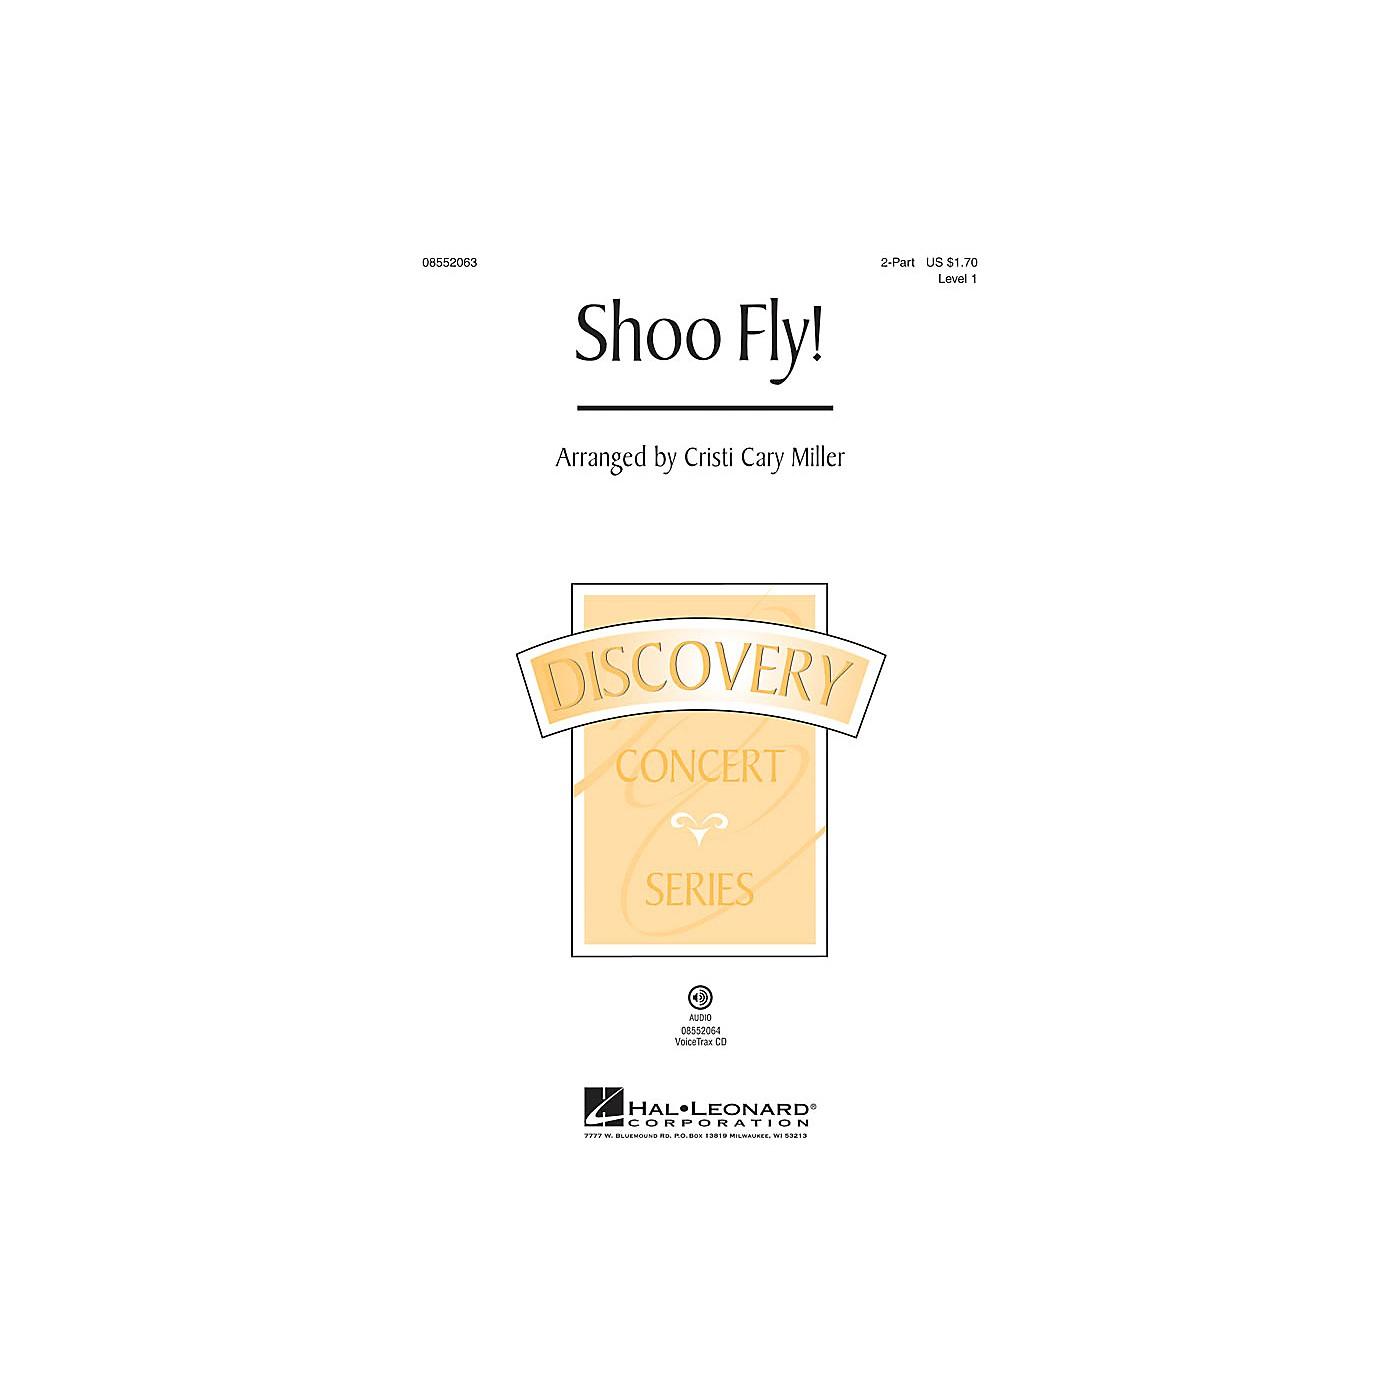 Hal Leonard Shoo Fly! (Discovery Level 1) VoiceTrax CD Arranged by Cristi Cary Miller thumbnail